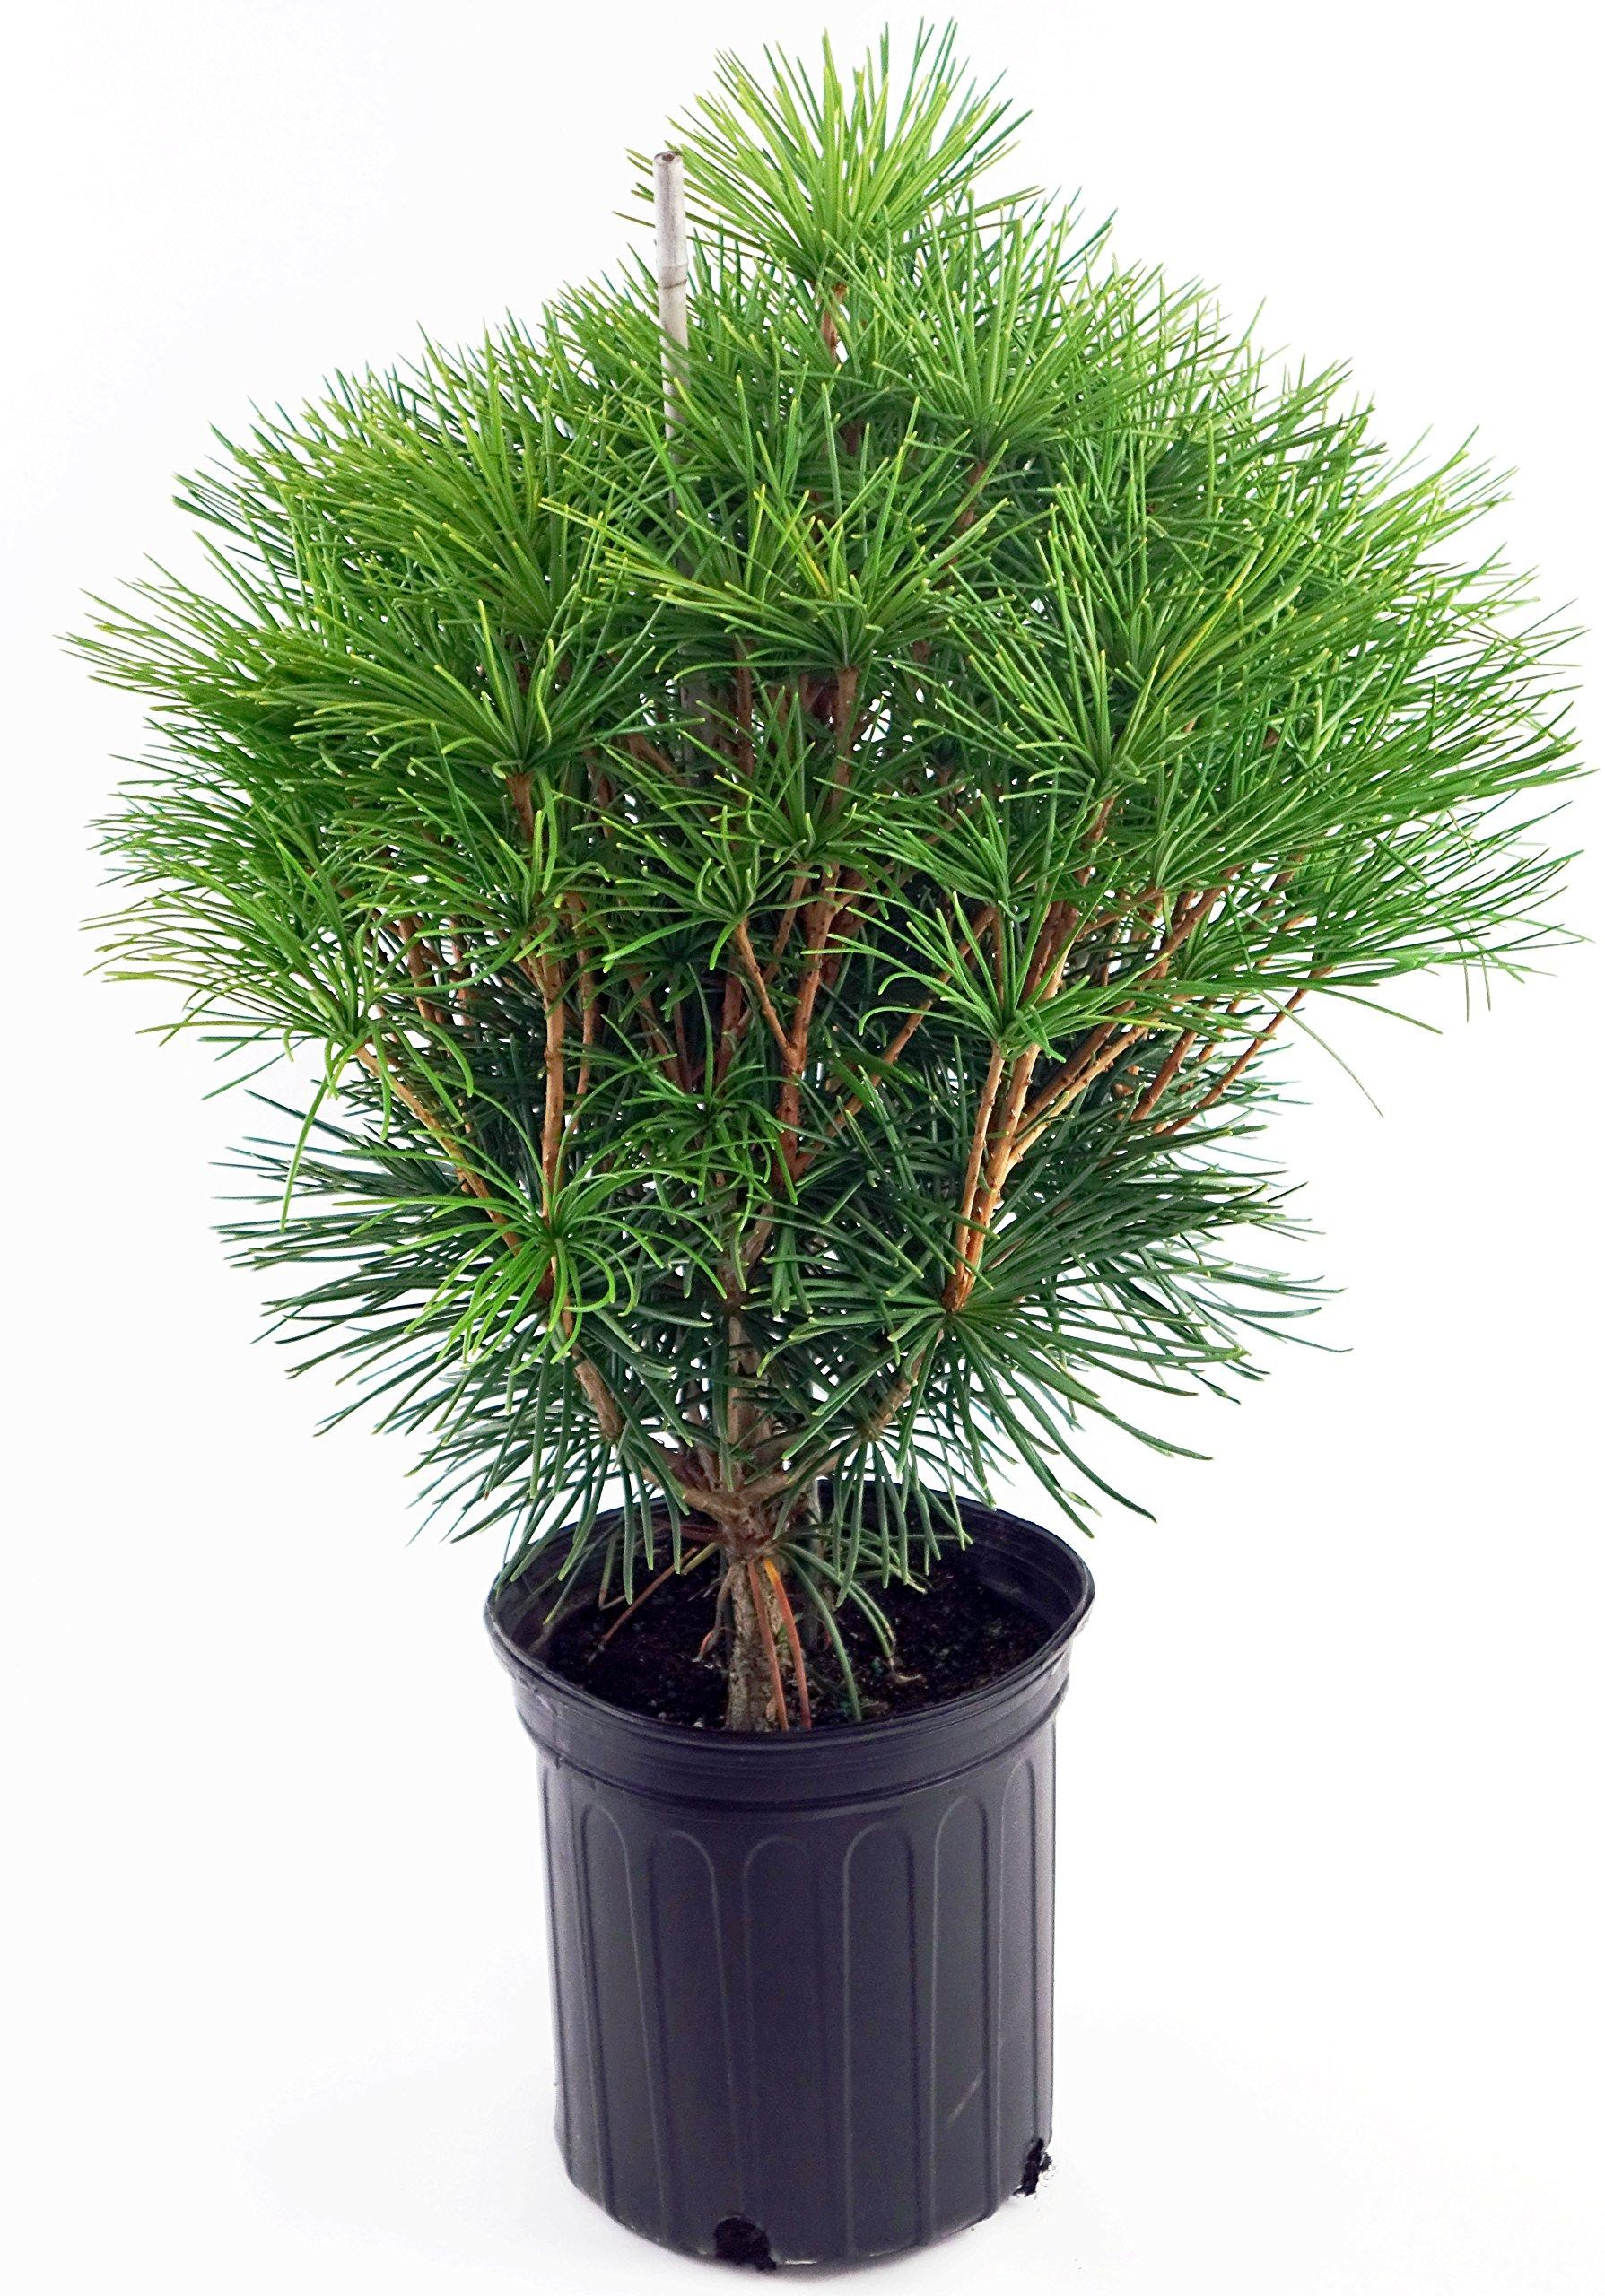 Sciadopytis verticillata (Japanese Umbrella Pine) Evergreen, #2 - Size Container